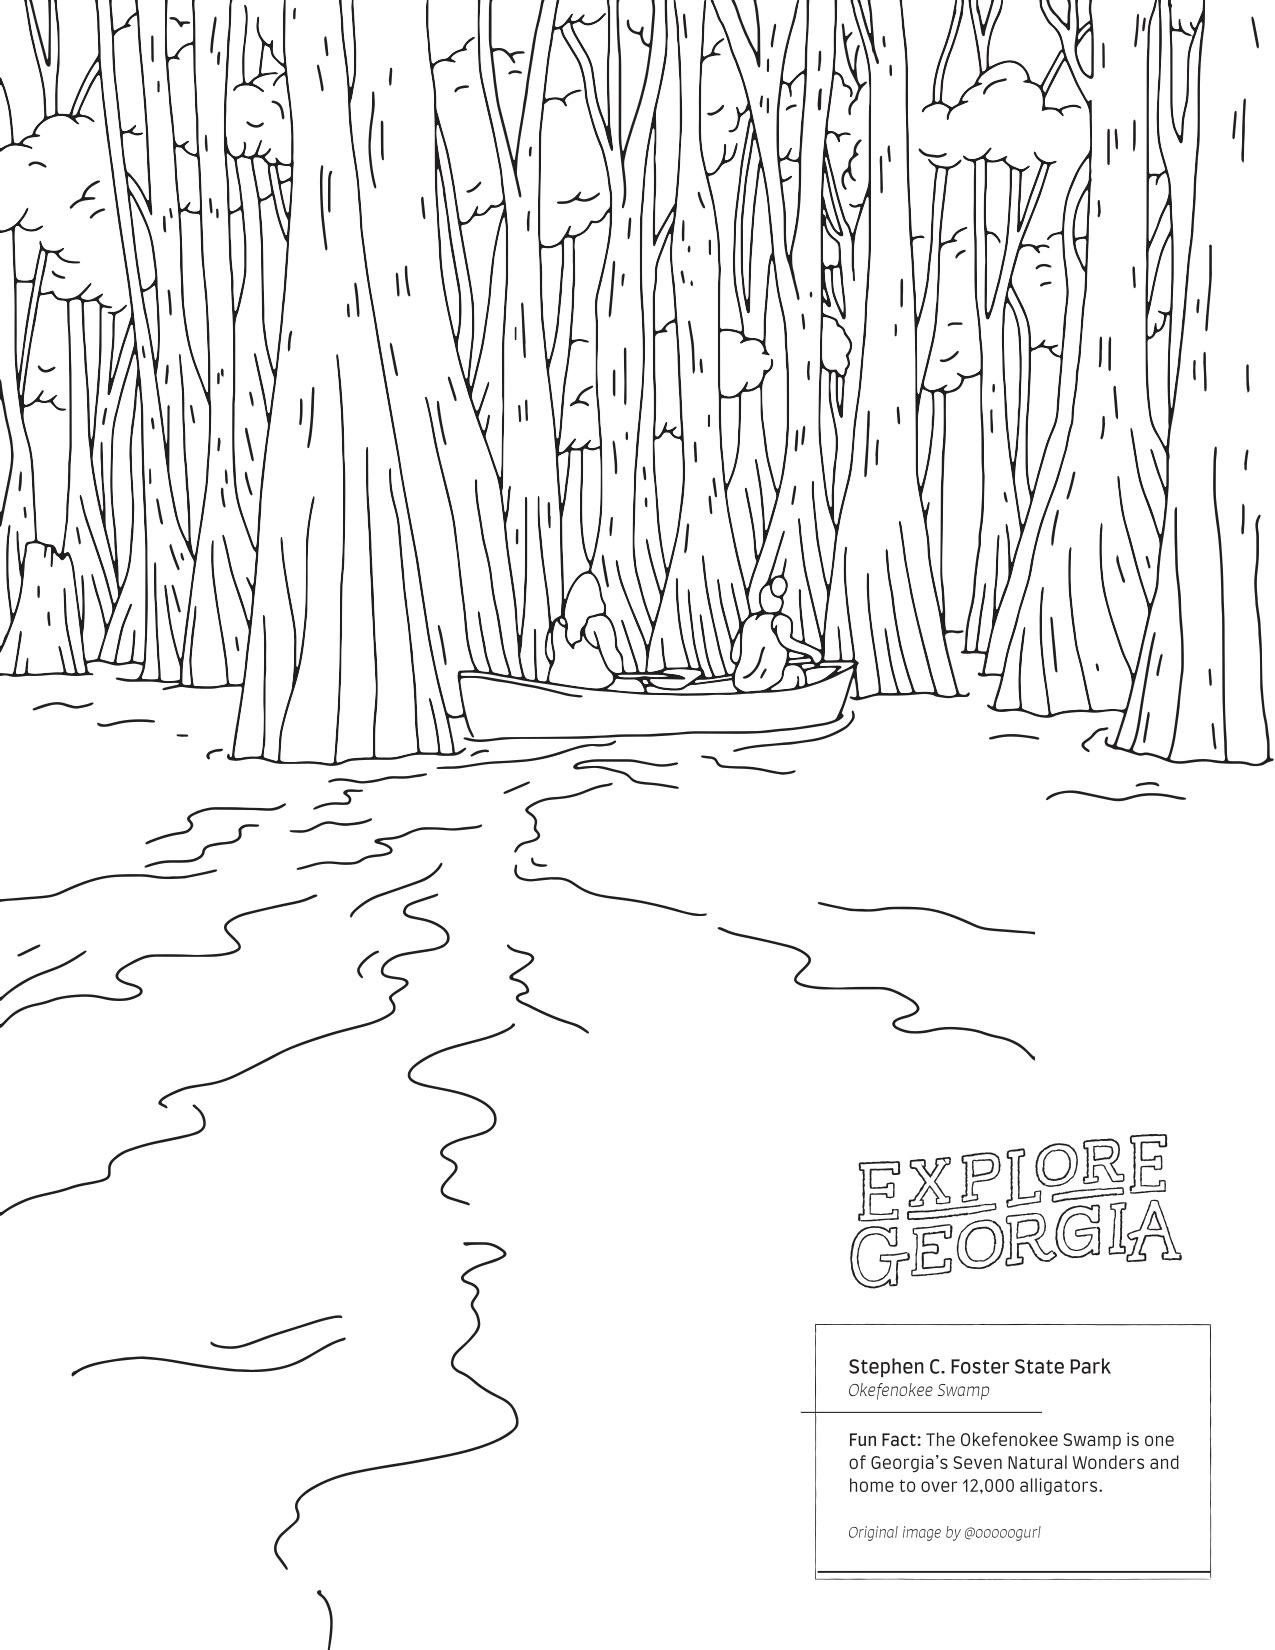 Okefenokee Swamp mural photo